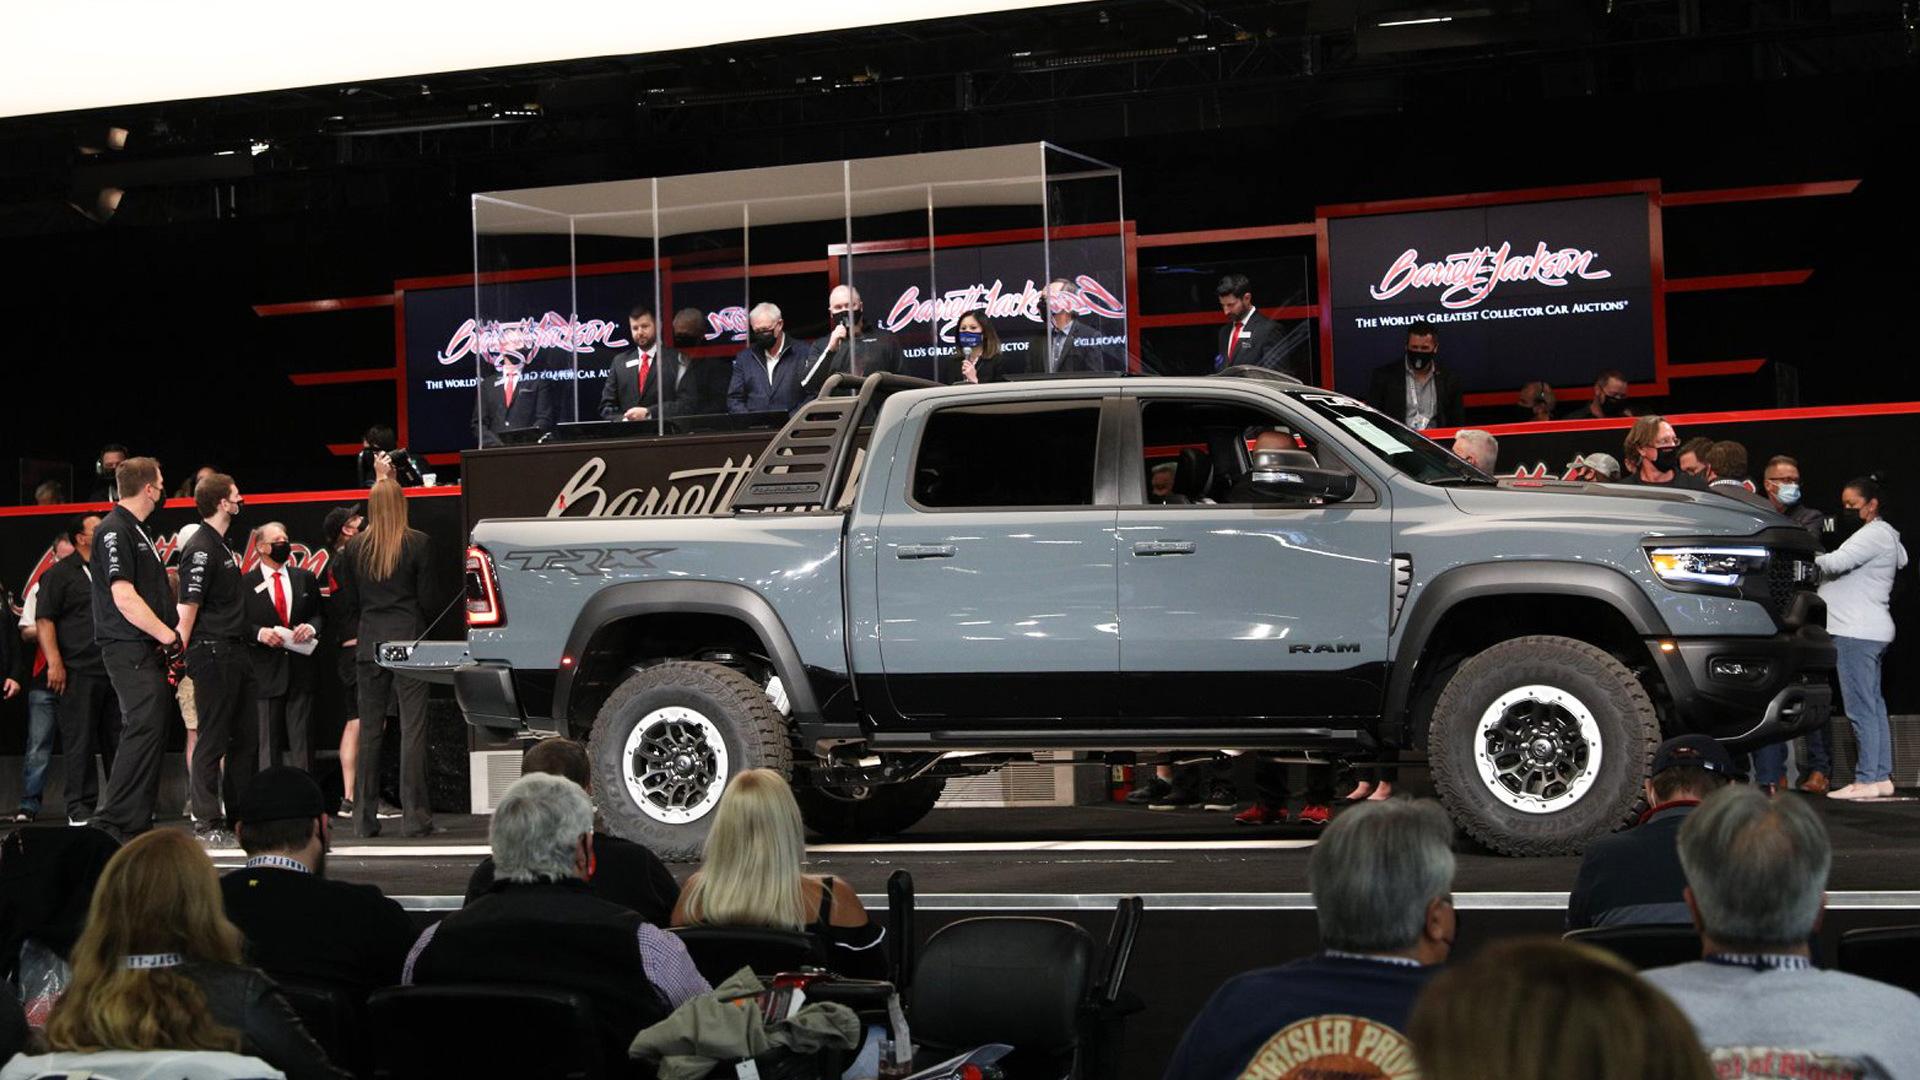 2021 Ram 1500 TRX bearing VIN 001 at Barrett-Jackson auction